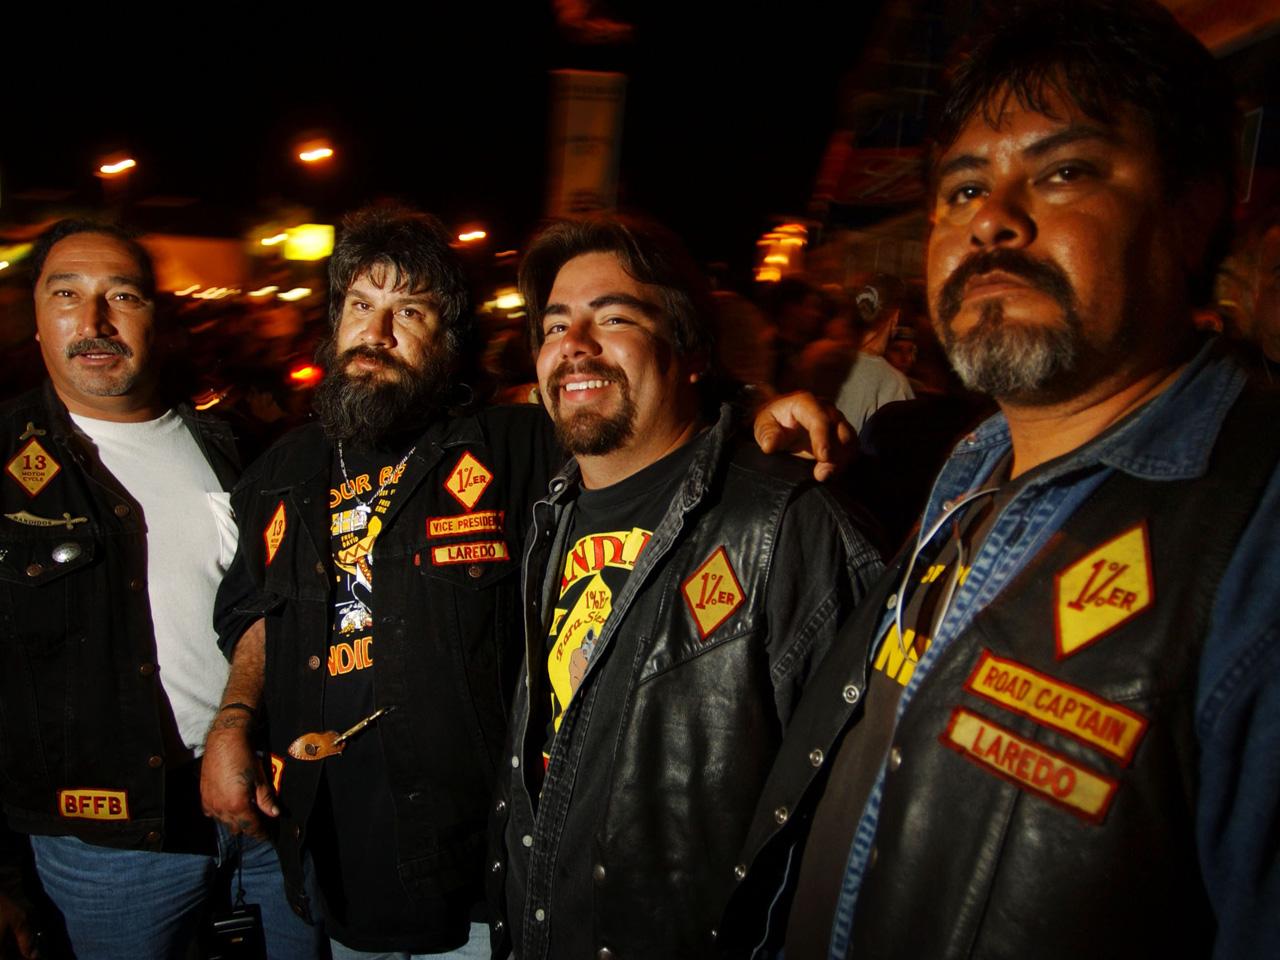 Bandidos vs  Cossacks: The biker gang war Texas warned of - CBS News